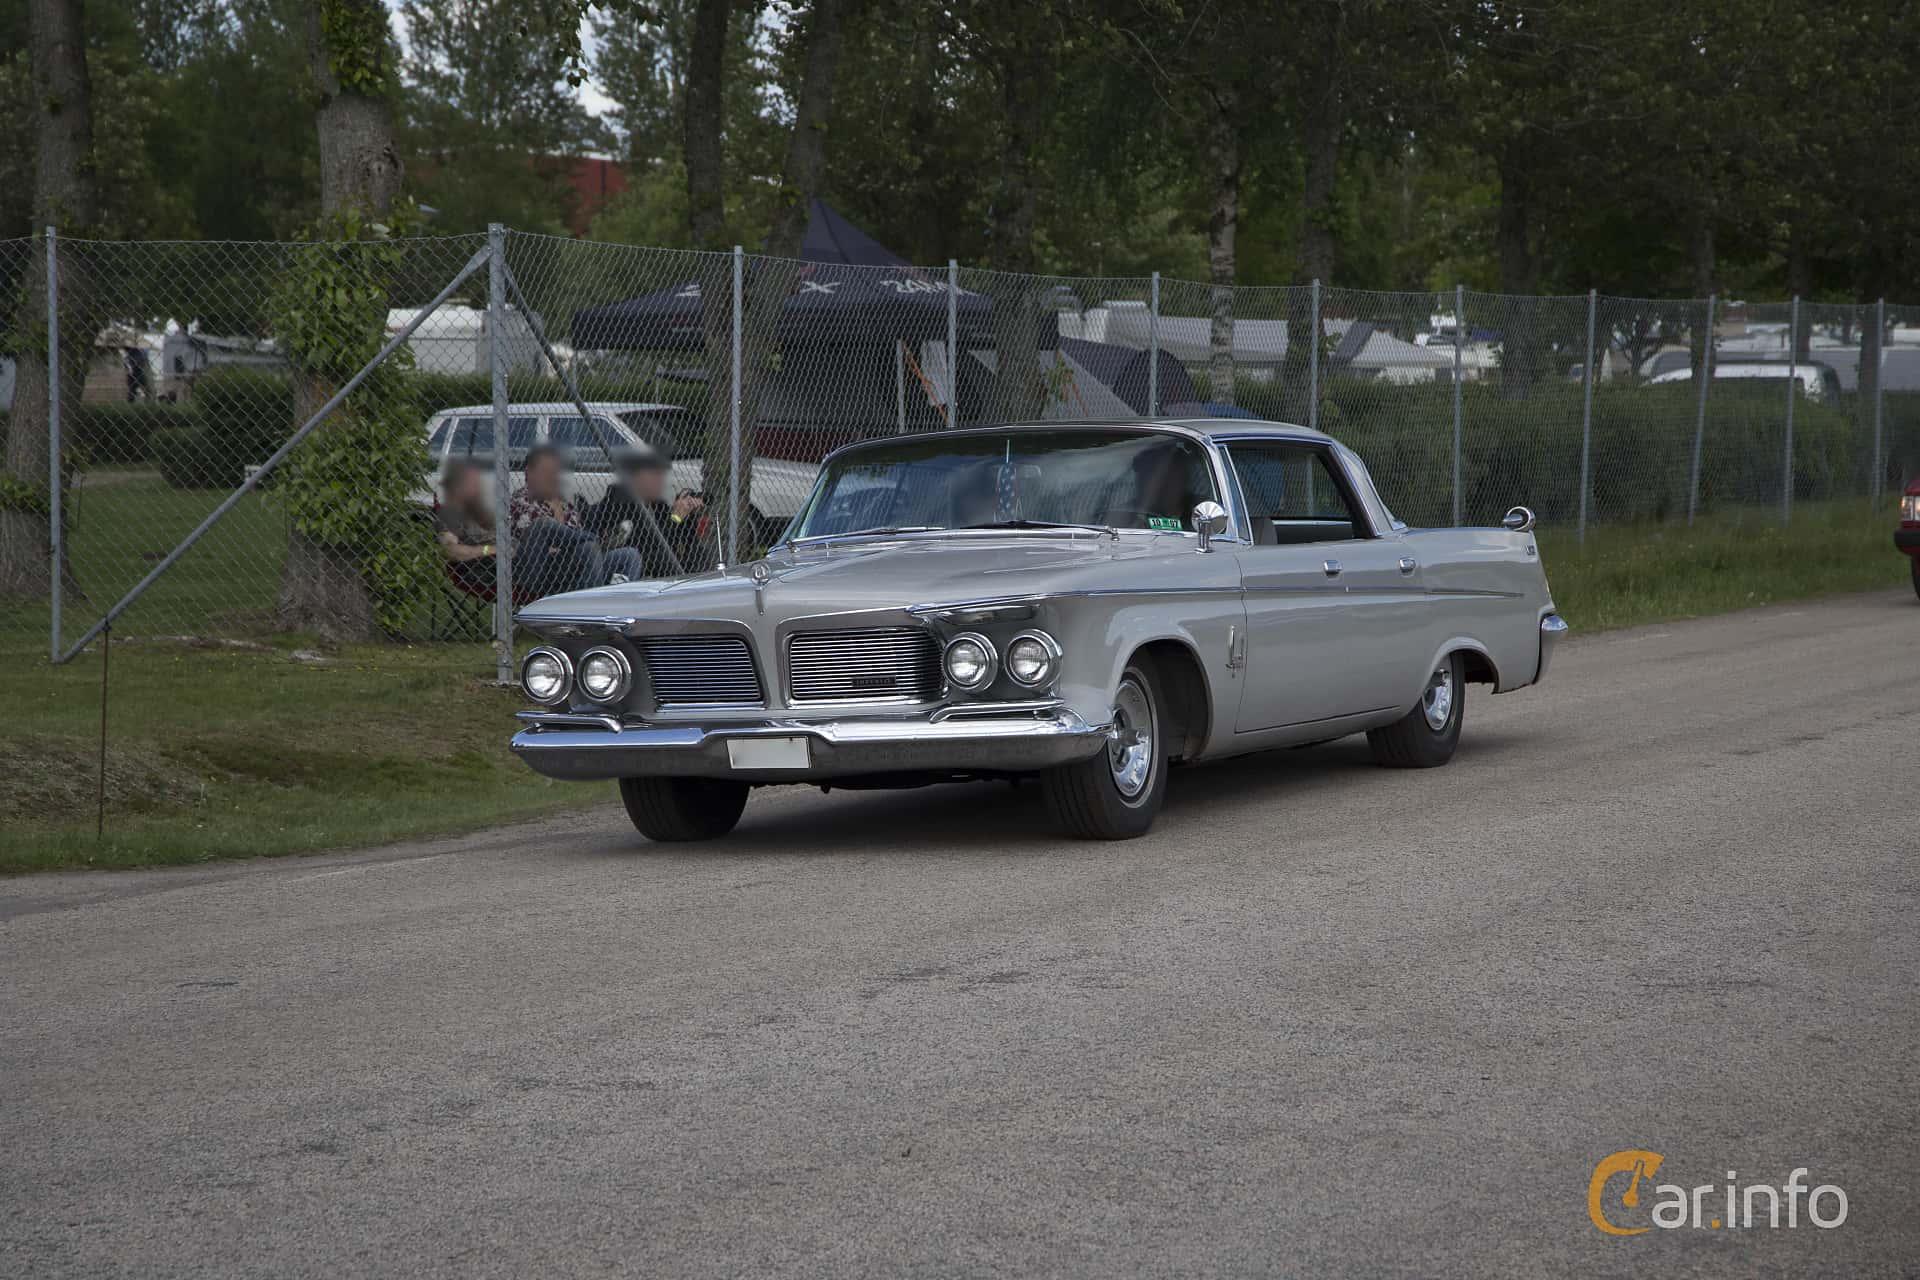 Imperial Crown 4-door Southampton 6.8 V8 TorqueFlite, 345hp, 1962 at Nostalgifestivalen i Vårgårda 2017